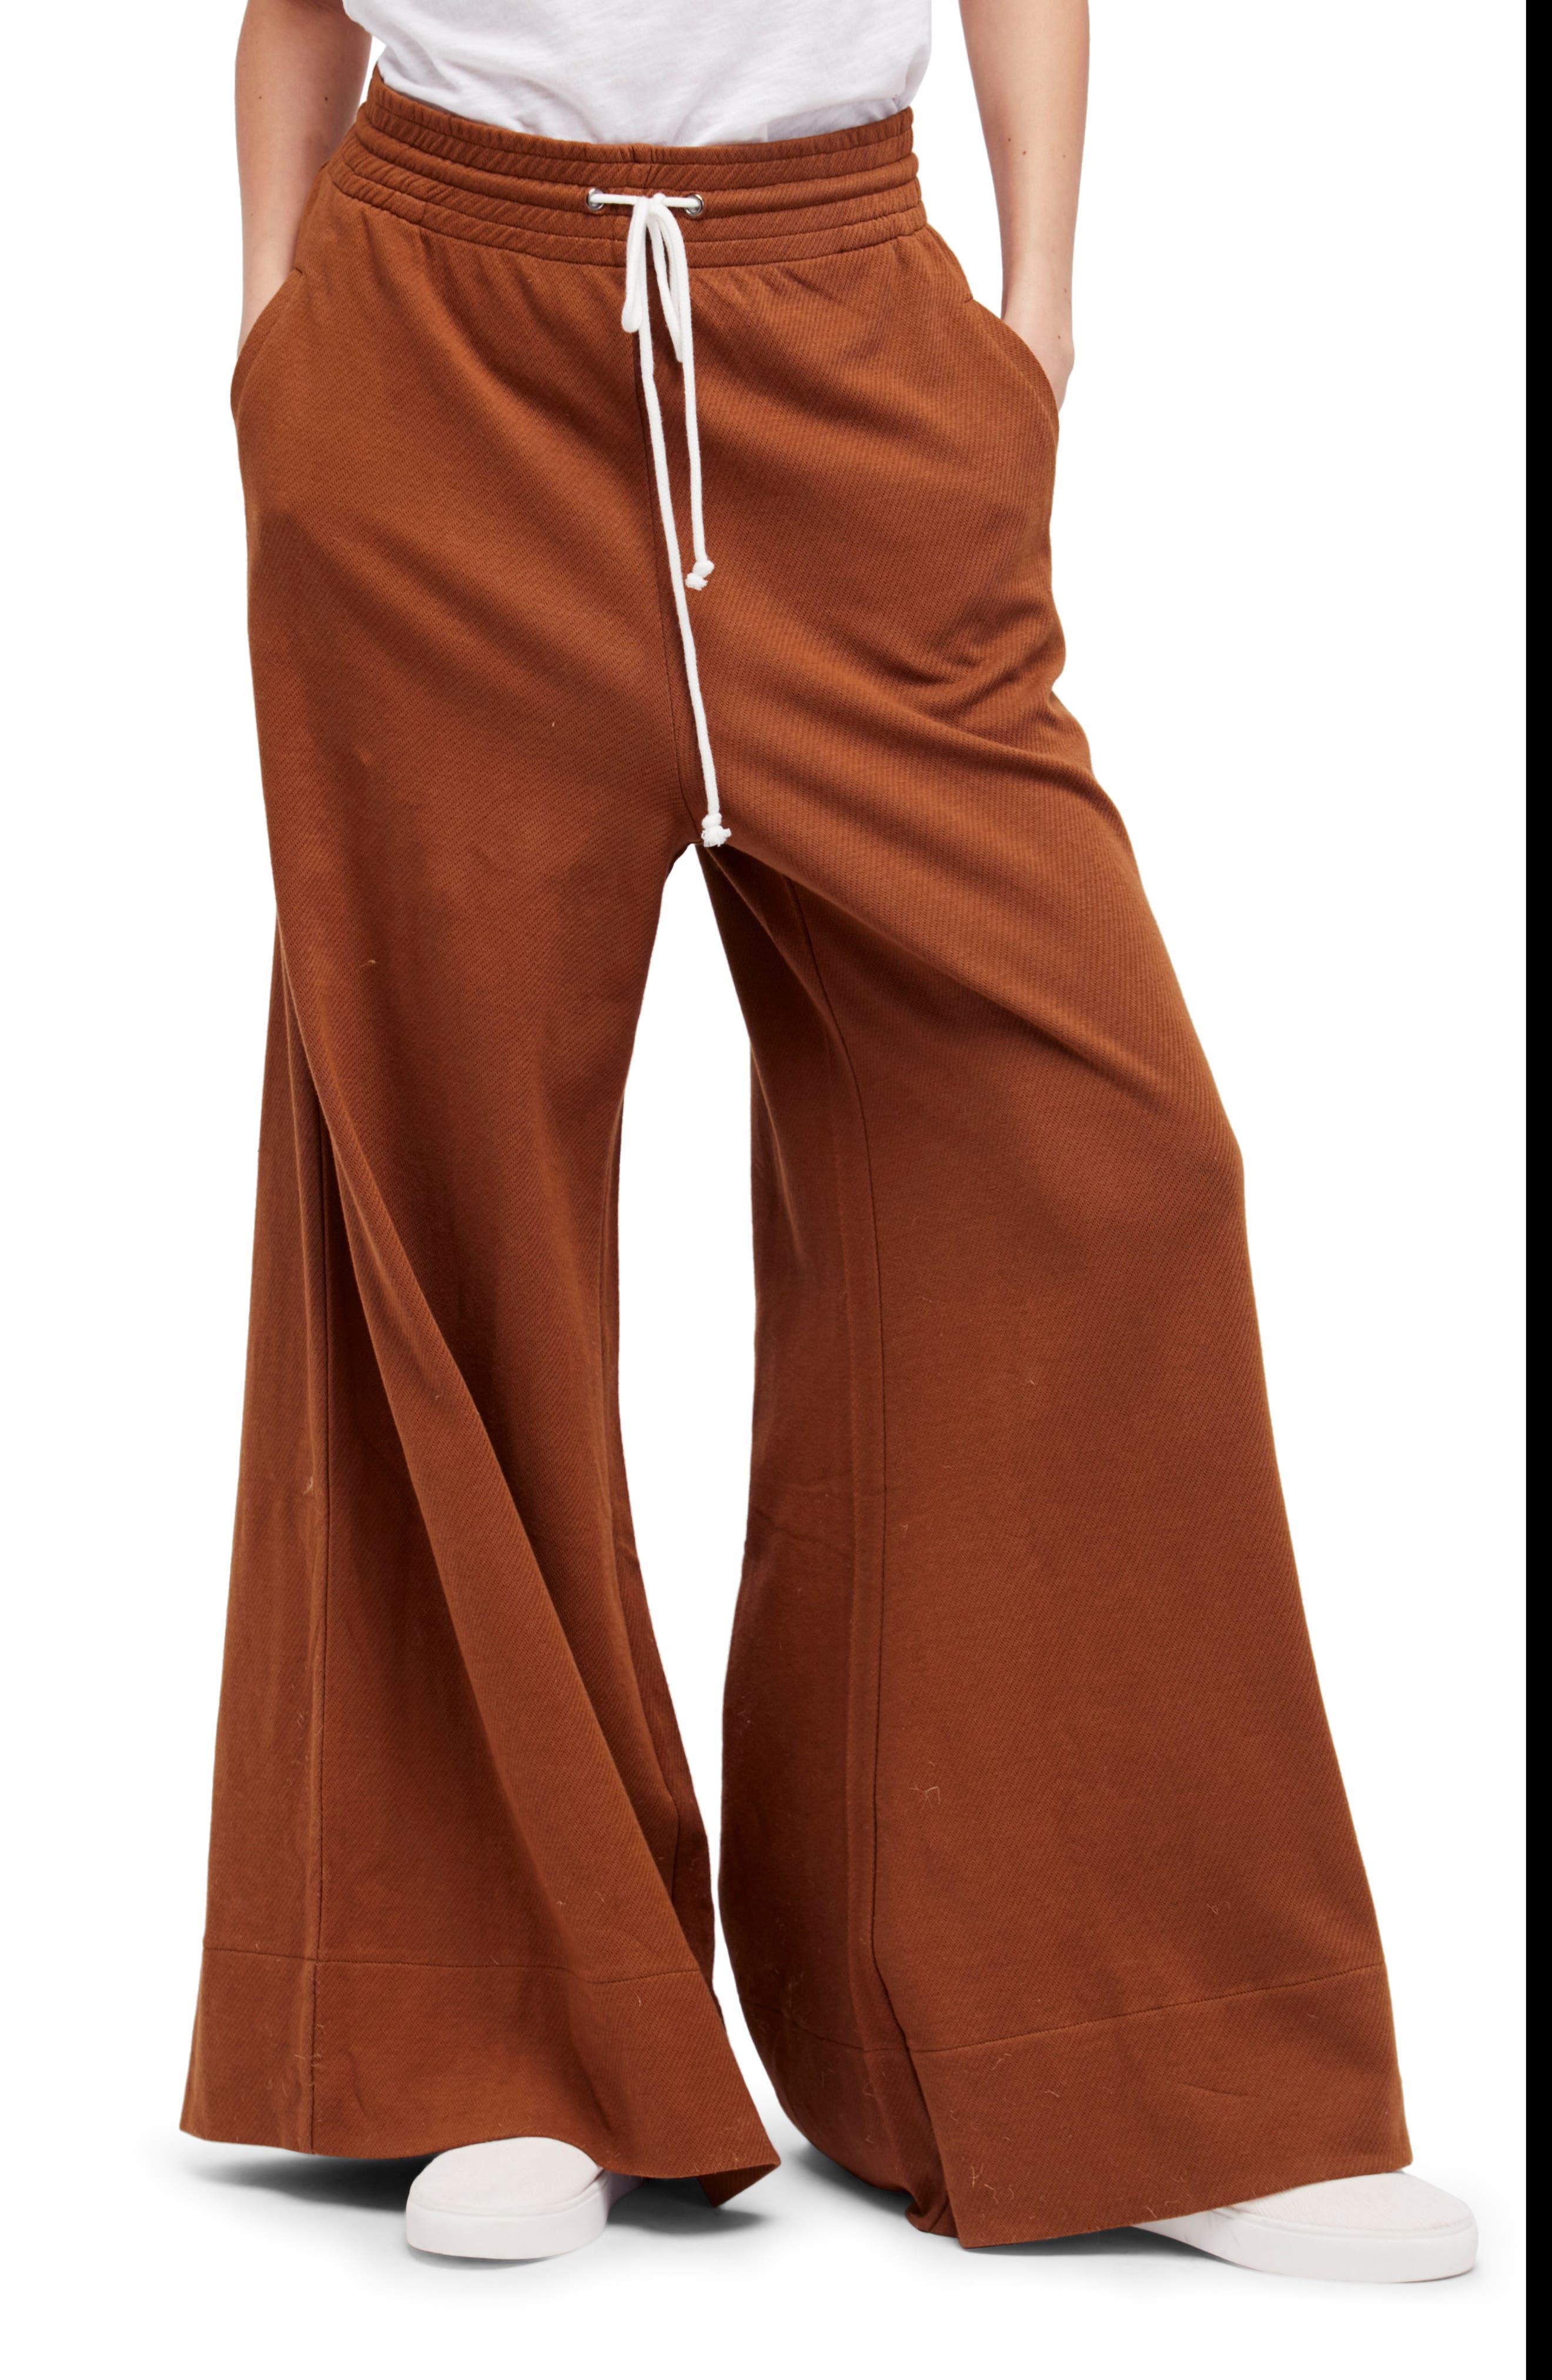 Strangelove Flare Sweatpants,                             Alternate thumbnail 2, color,                             200